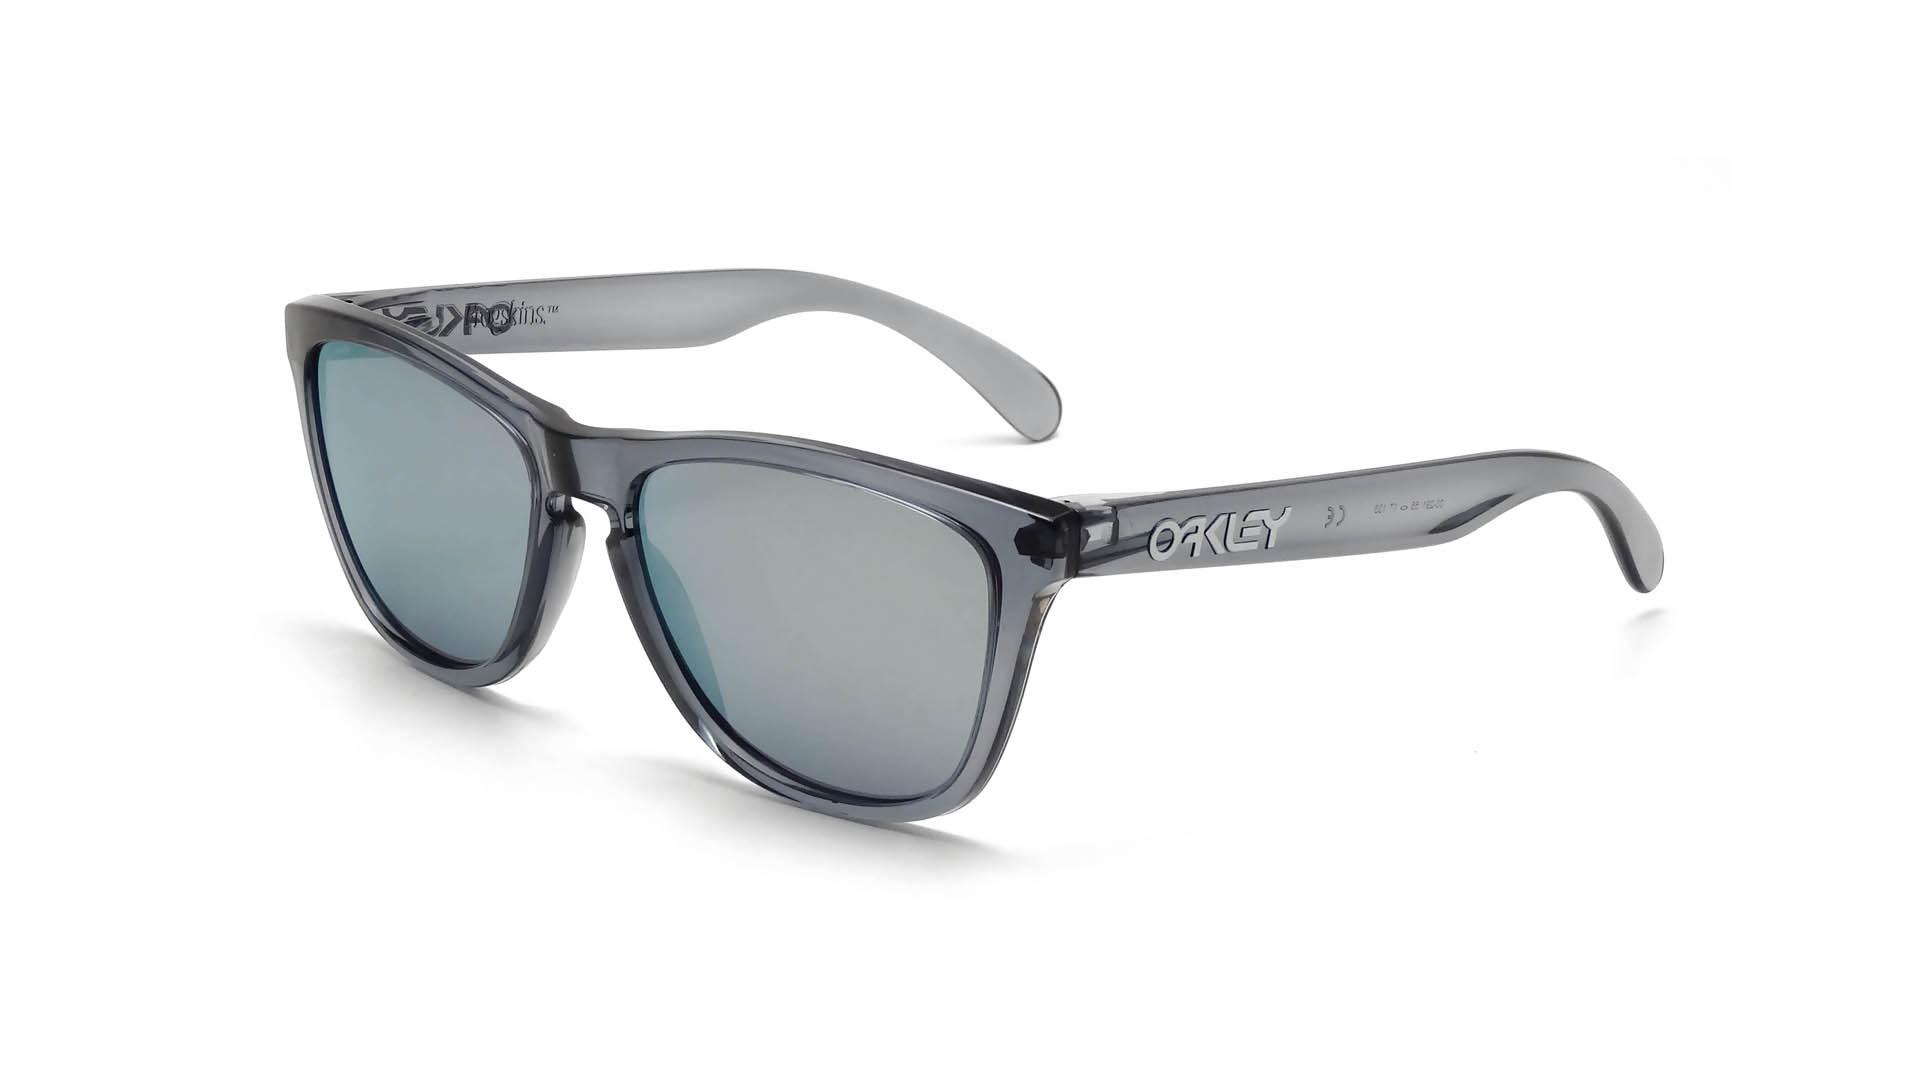 8f1f060f2c5 Oakley Frogskins Sunglasses Rainbow « Heritage Malta